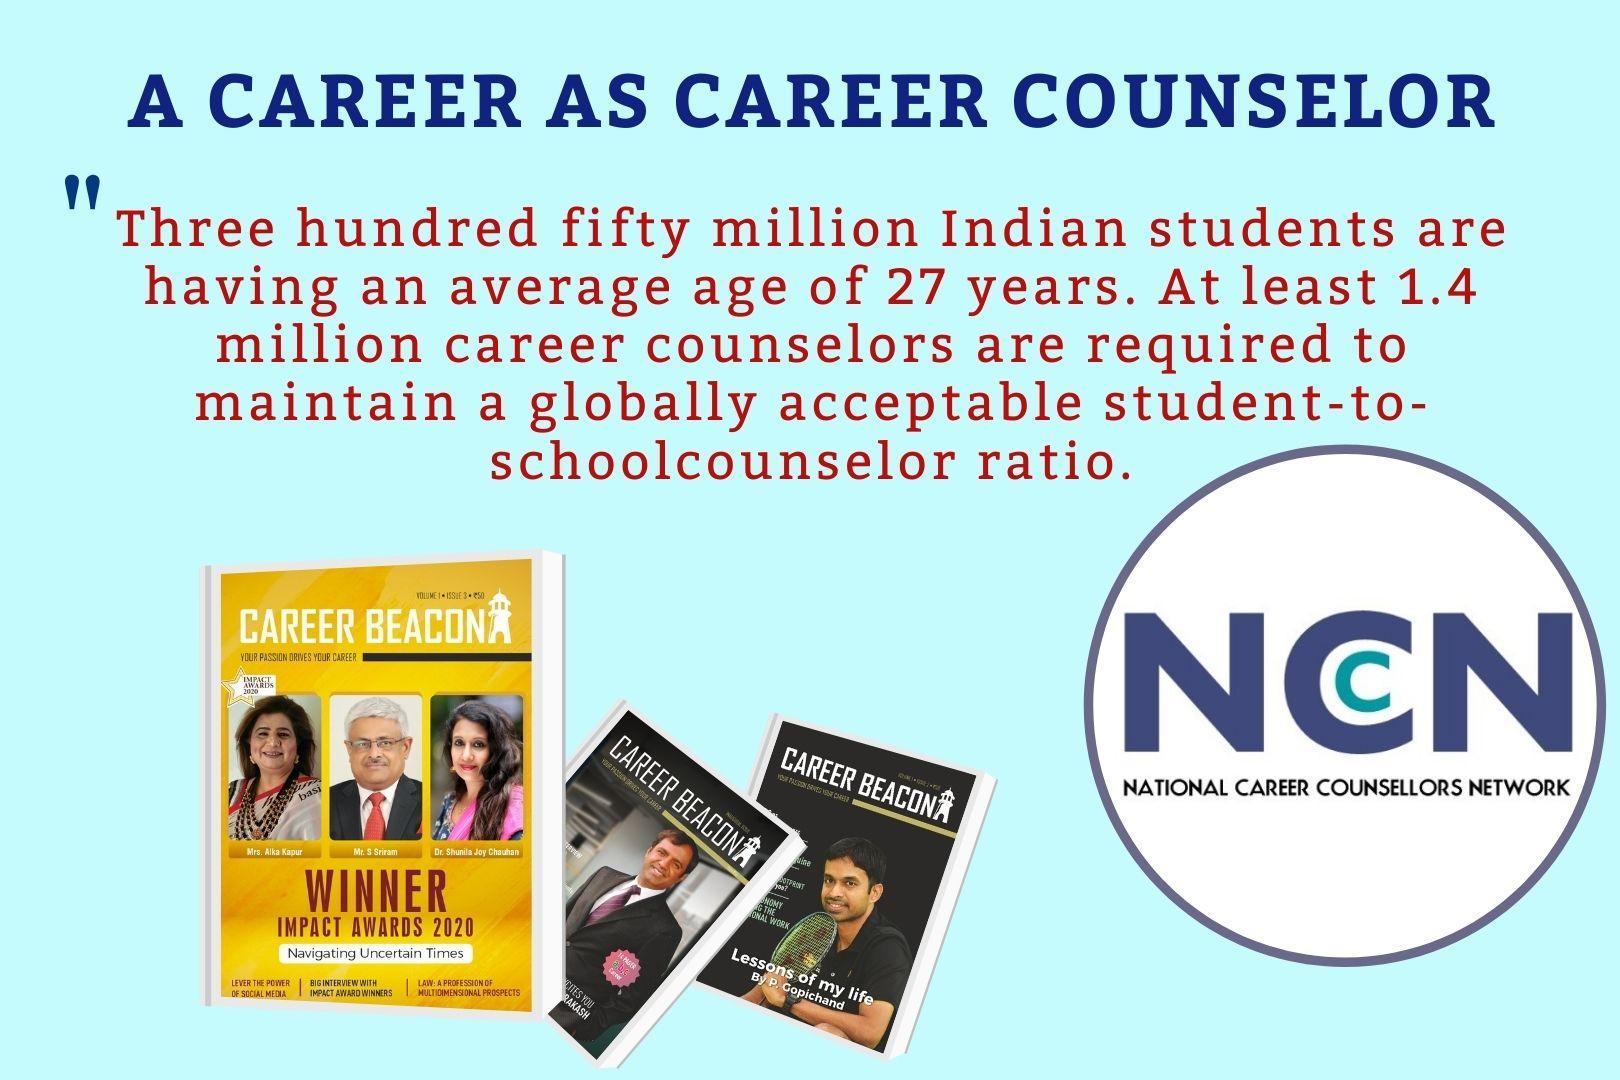 Career as Career Counsellor